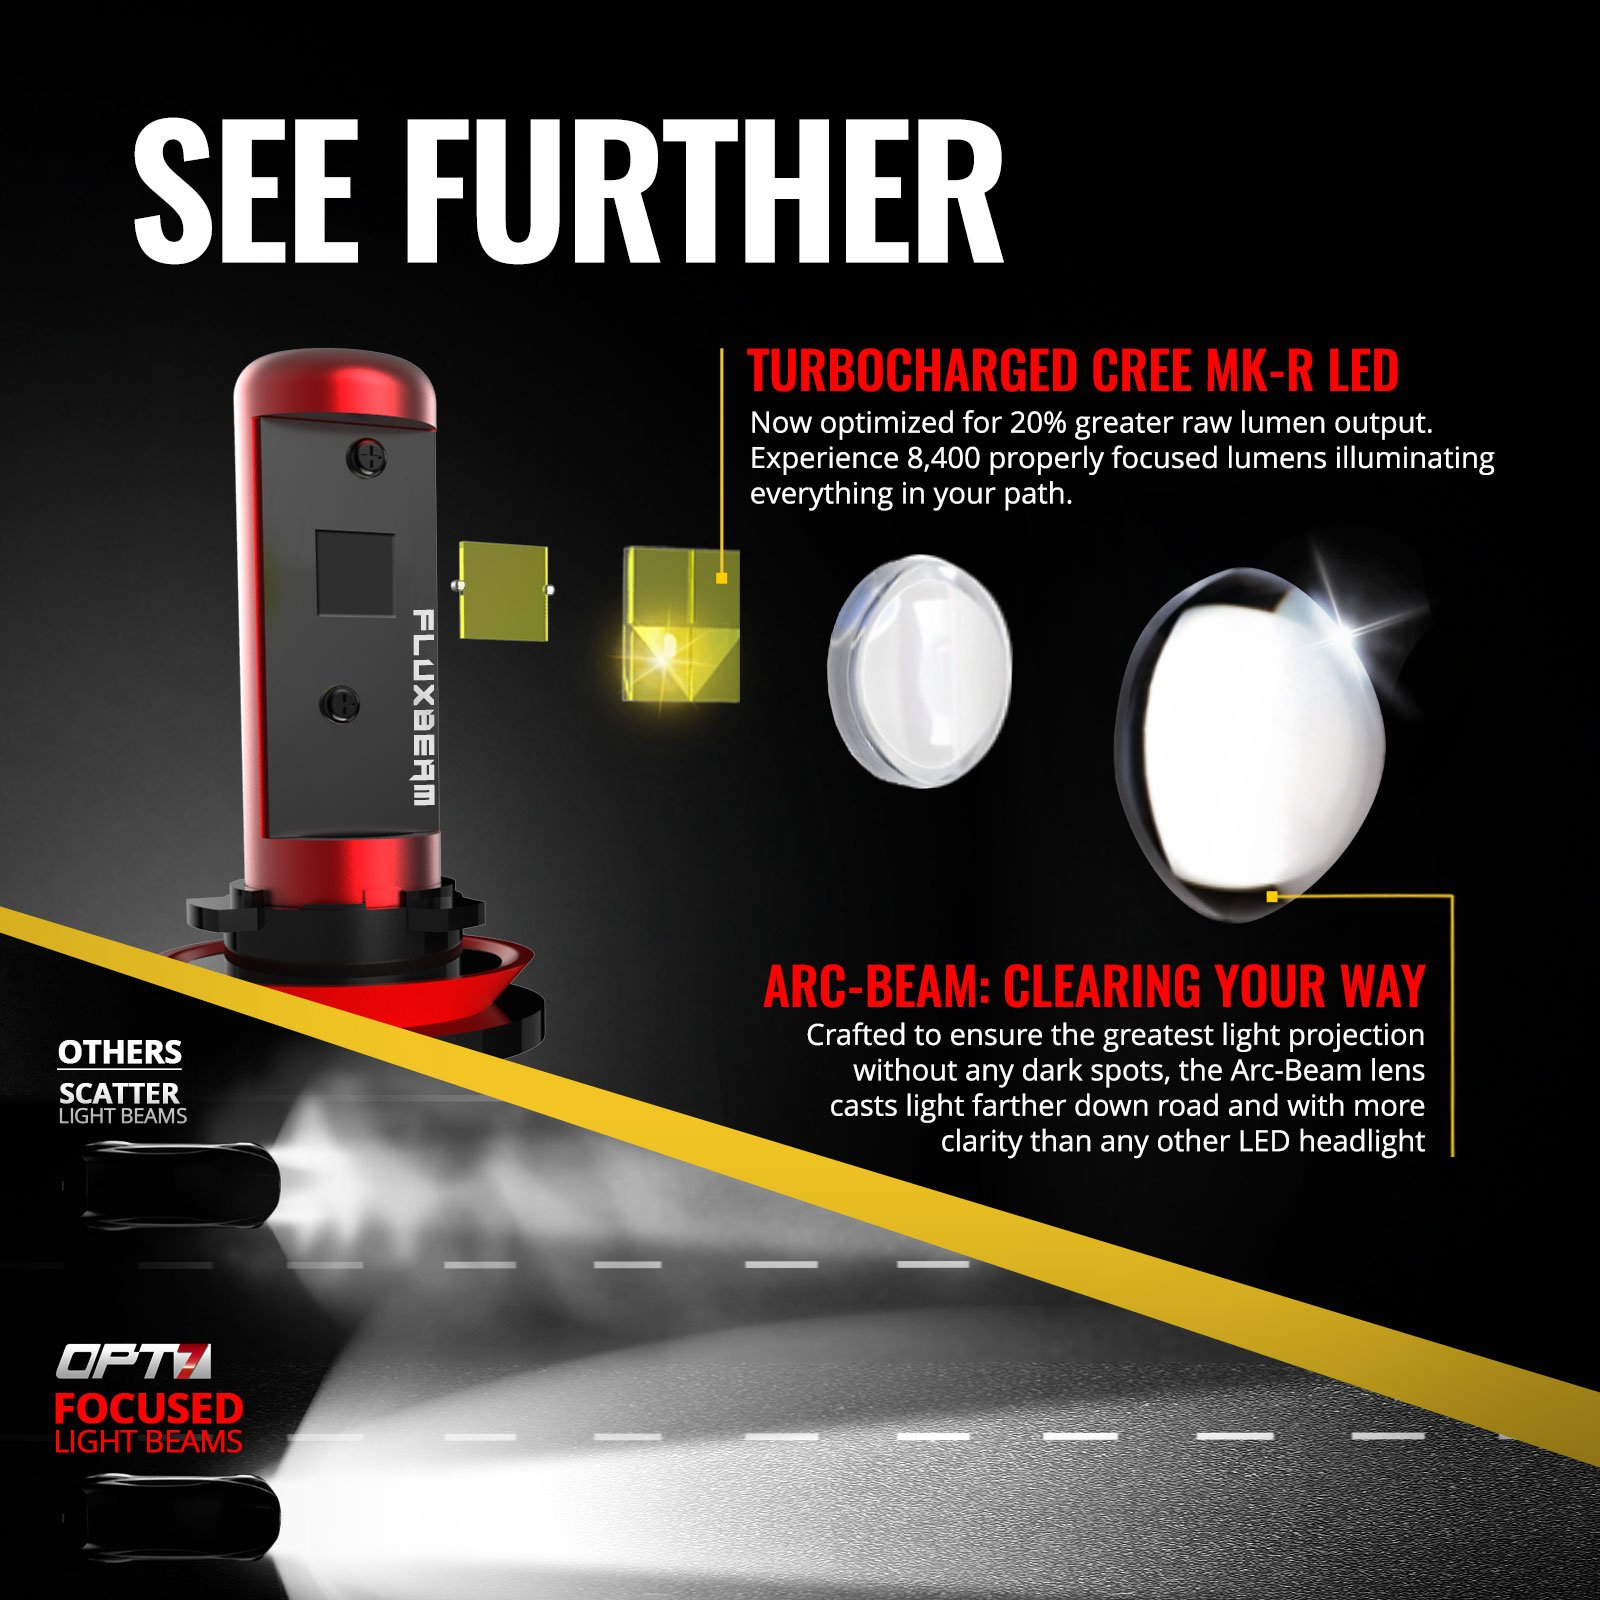 OPT7 Fluxbeam X 9007 LED Headlight Bulbs w/Arc-Beam Lens - 8,400LM 6000K Daytime White - All Bulb Sizes - 80w - 2 Year Warranty by OPT7 (Image #5)